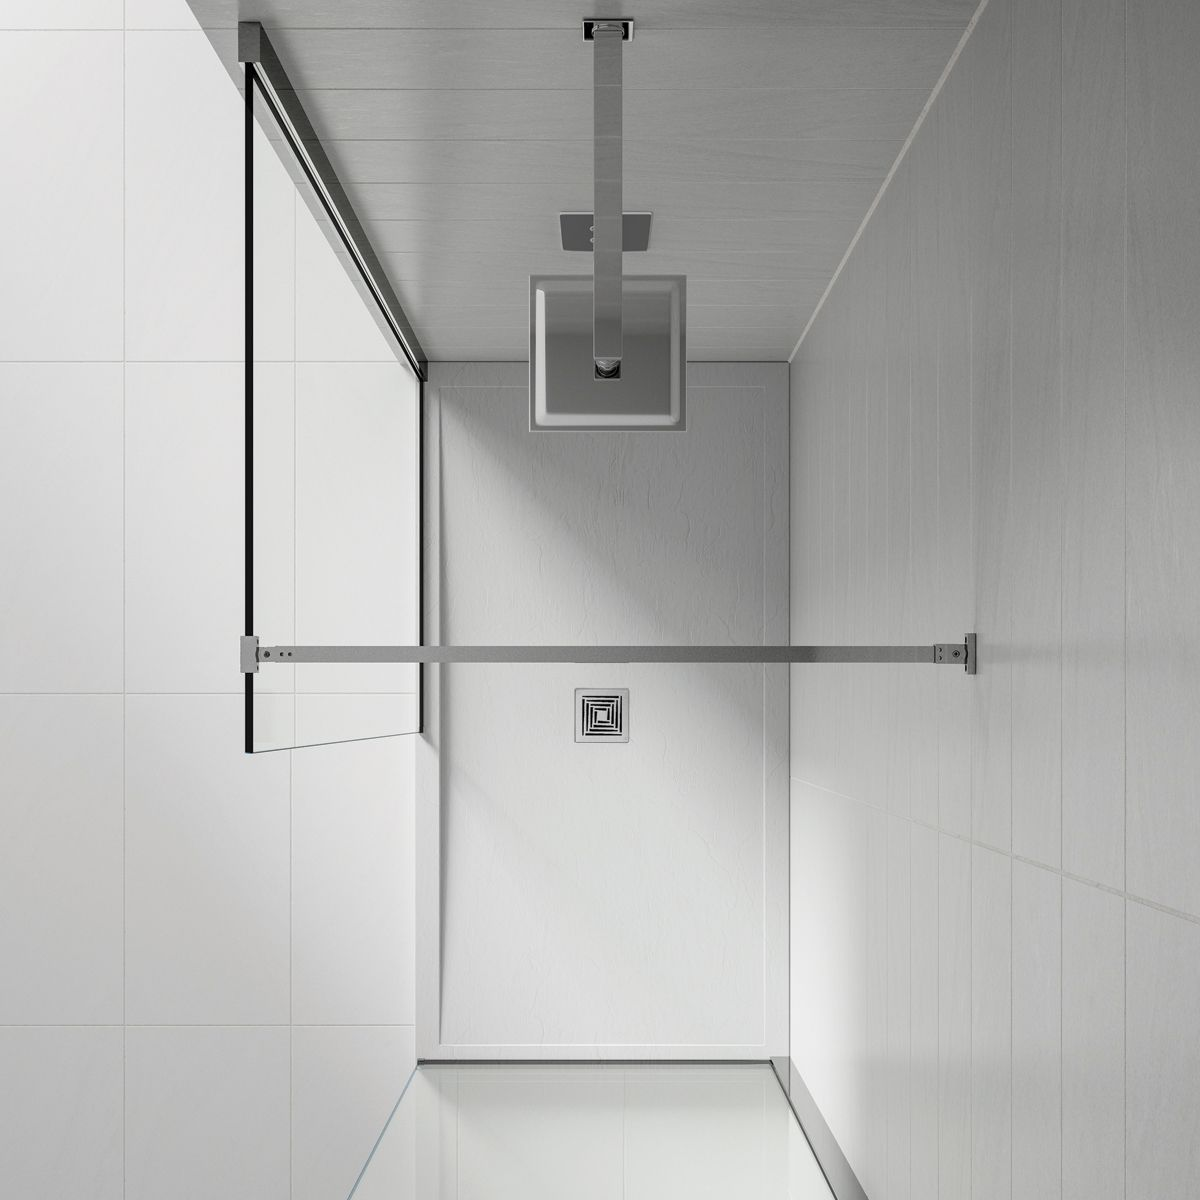 Aquadart Grey Slate Shower Tray 1200 x 800 Overhead